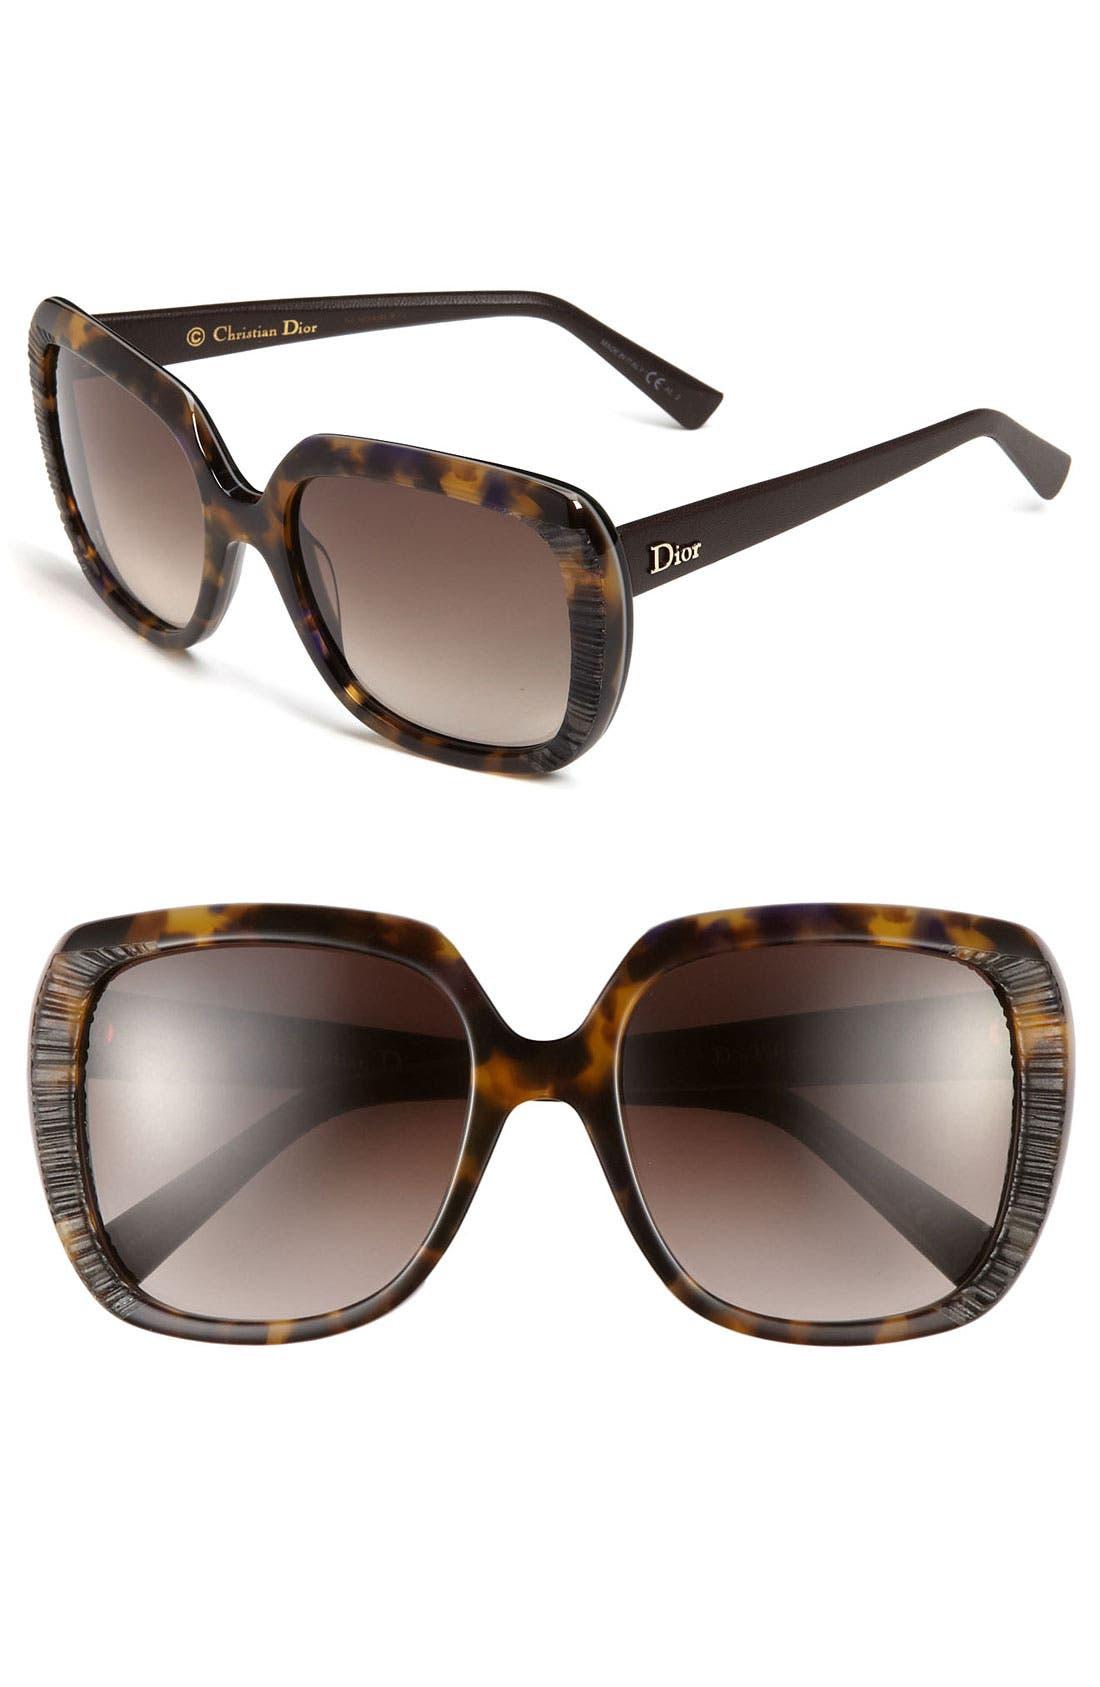 Alternate Image 1 Selected - Dior 'Taffetas' 59mm Sunglasses